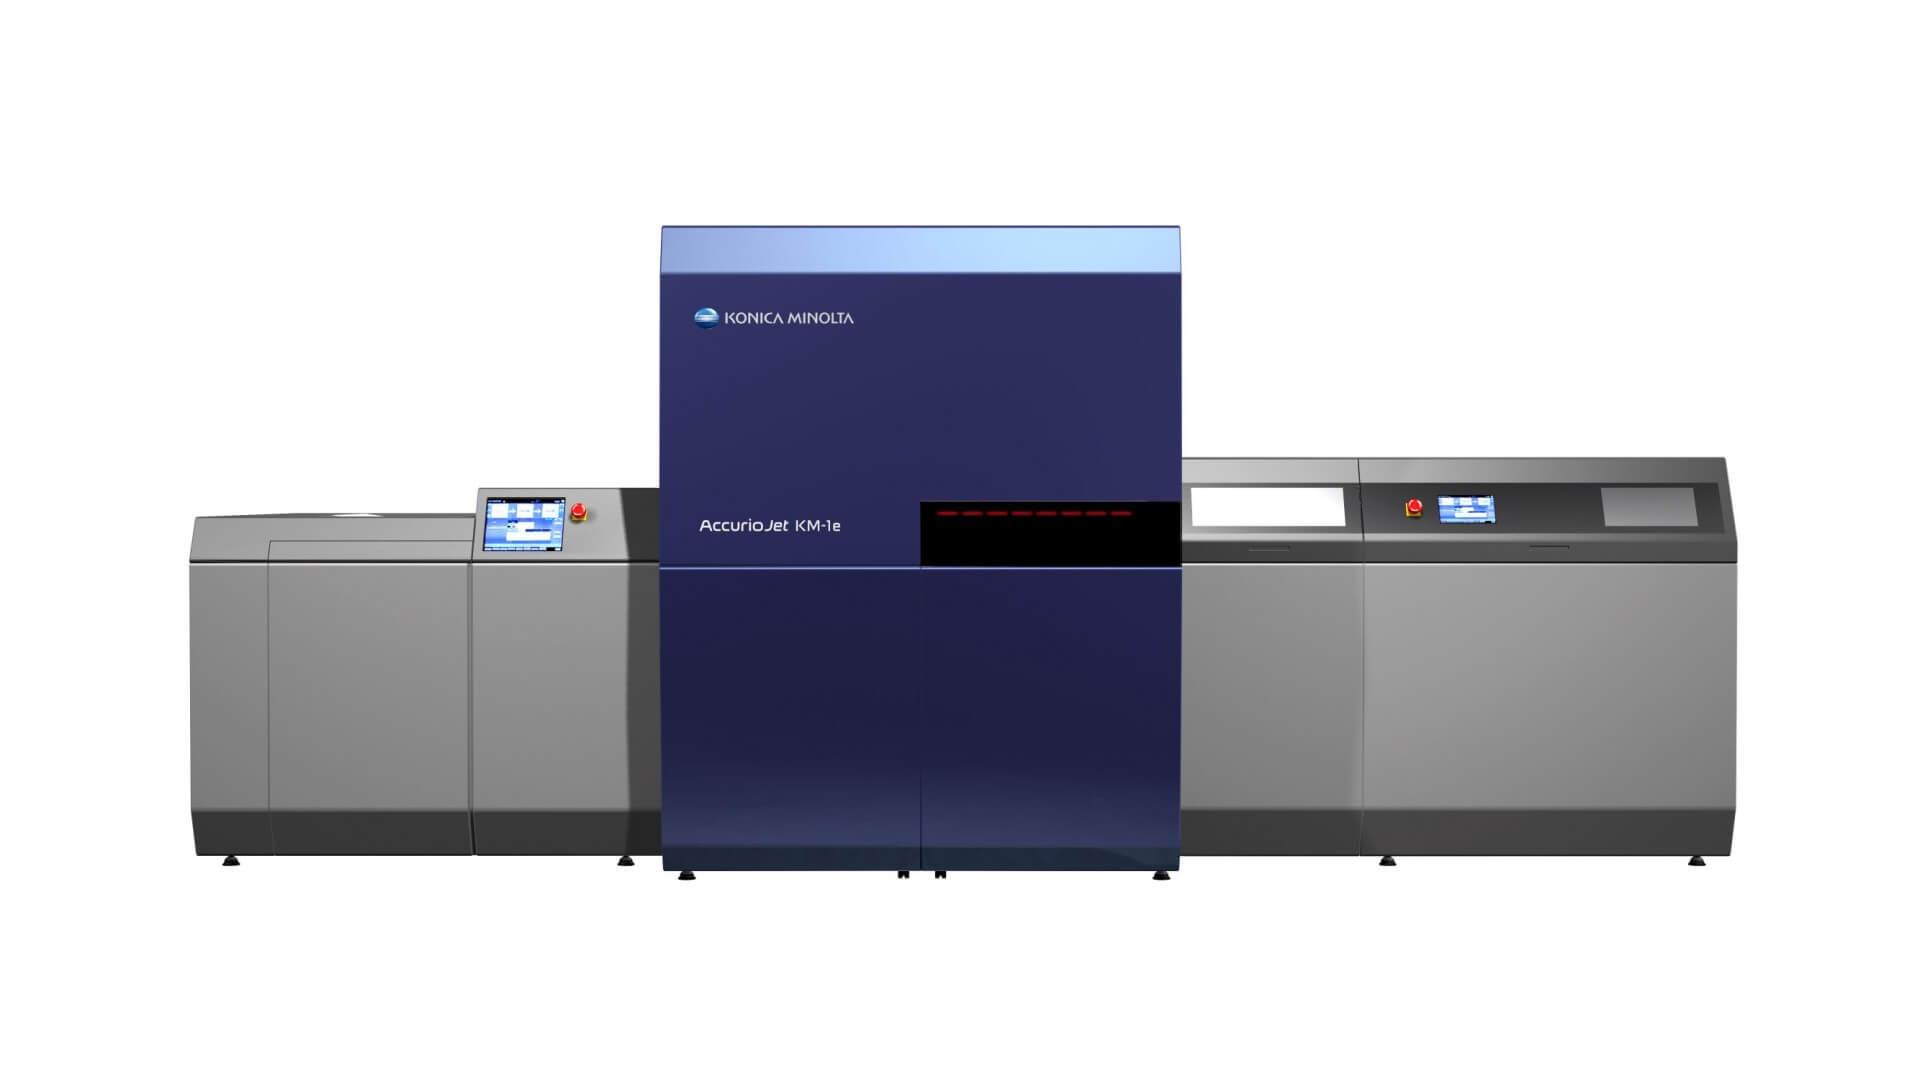 [News Release] Meridian Introduces AccurioJet KM-1e Digital Production Press